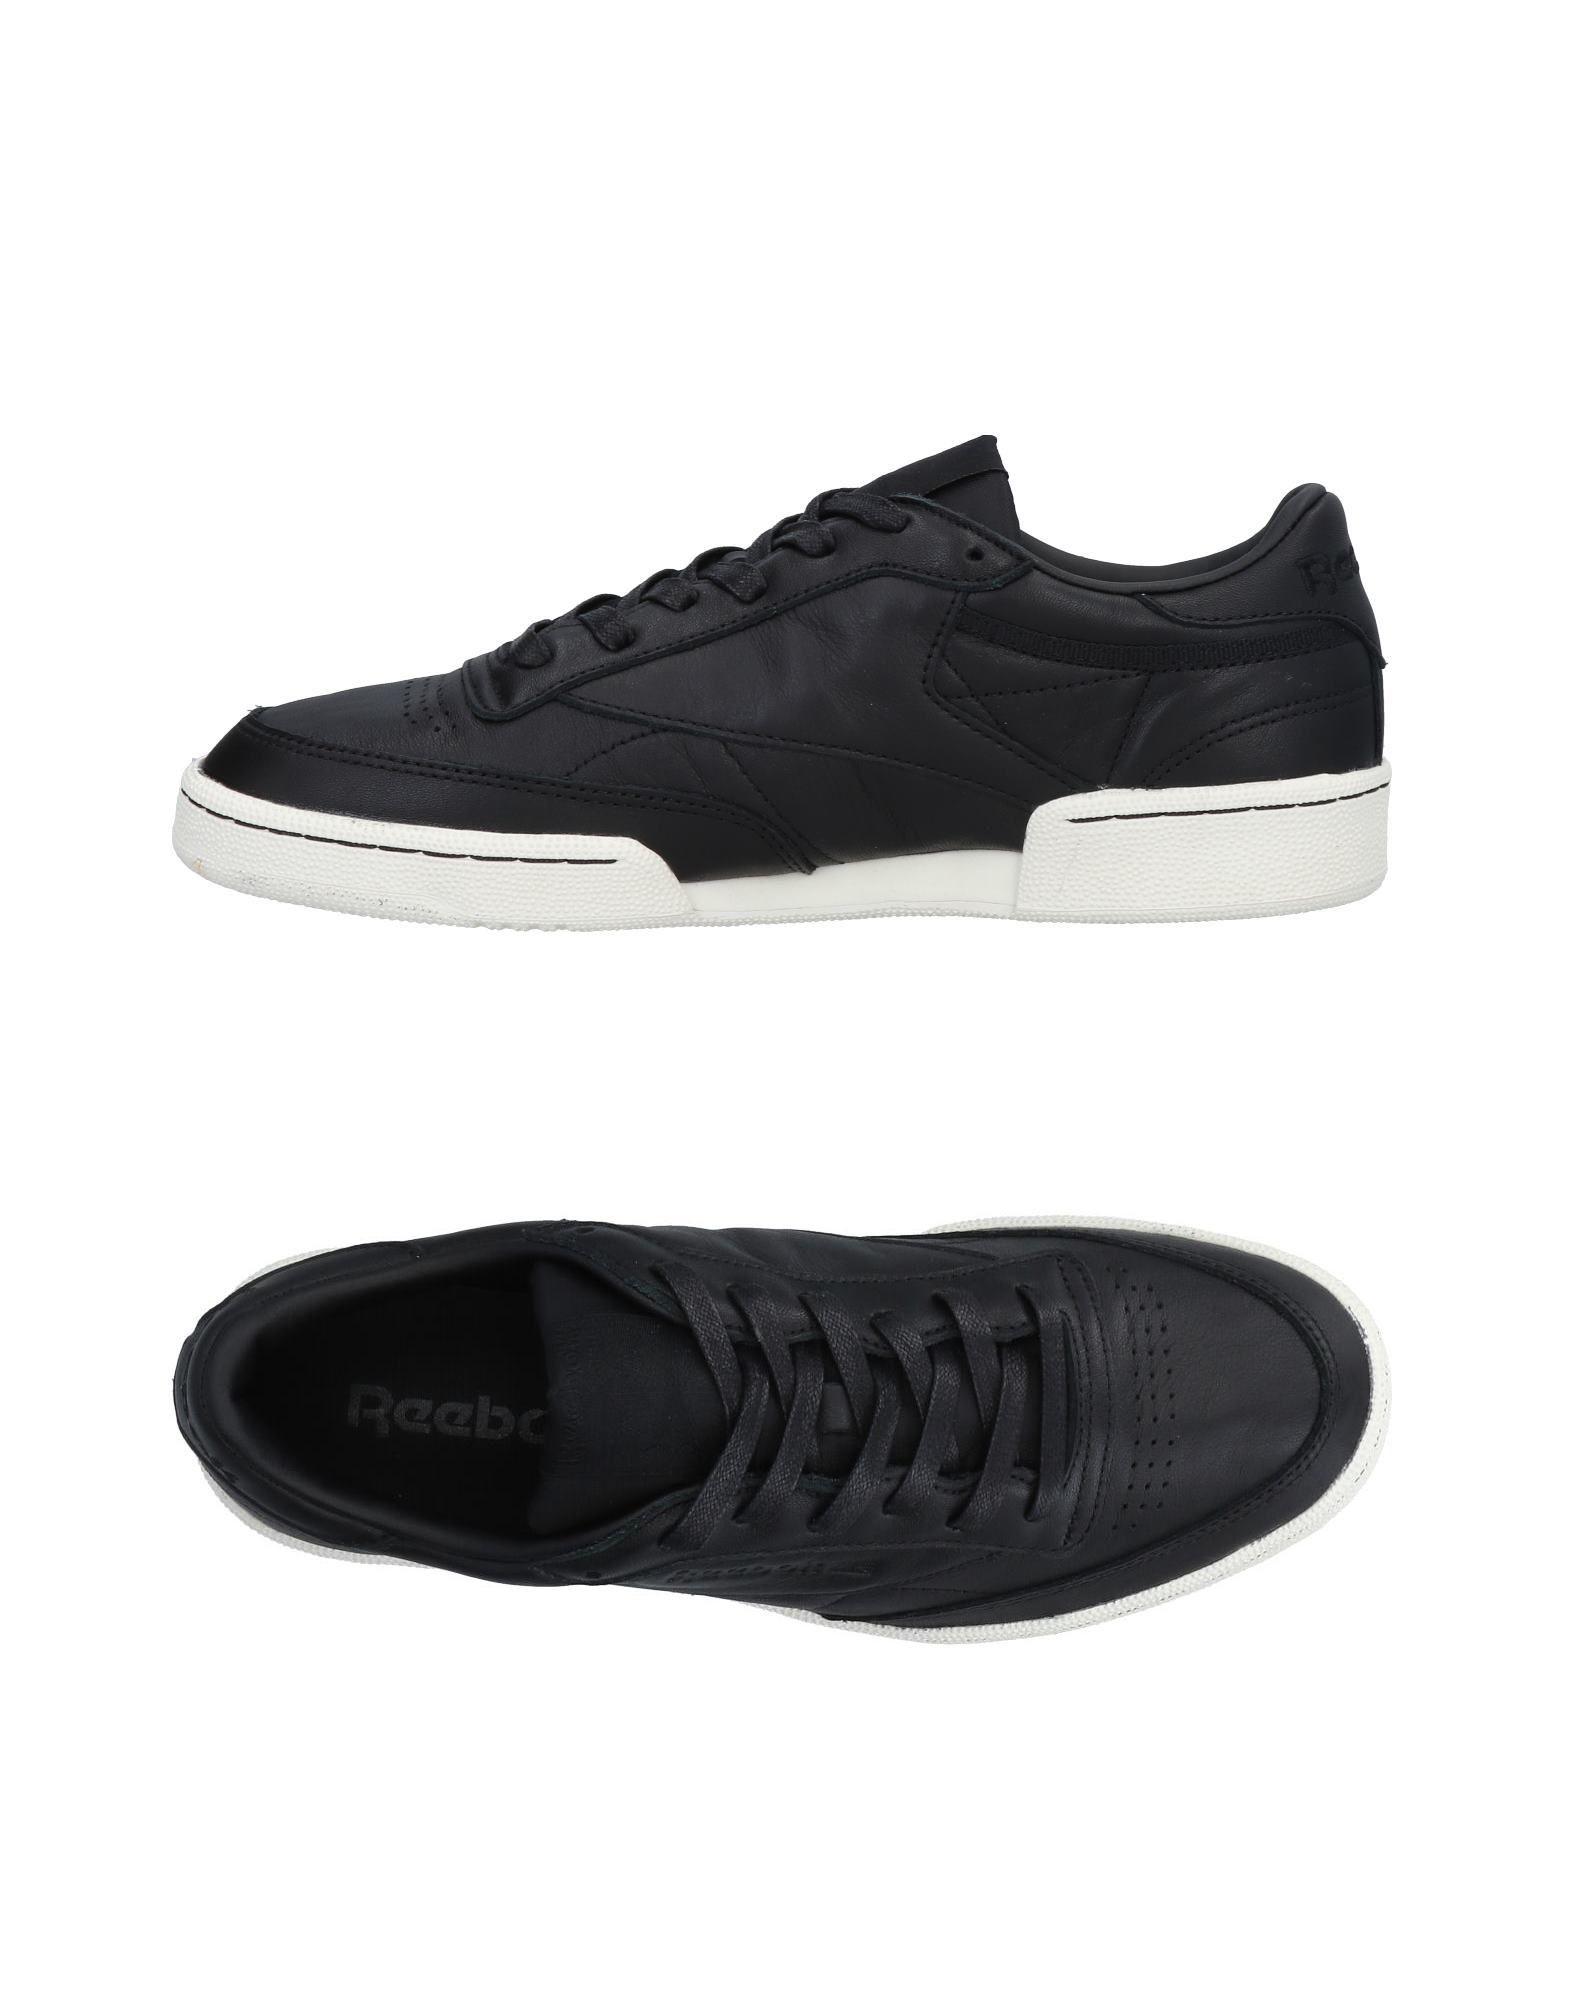 Moda Sneakers Reebok Uomo - 11466140NR